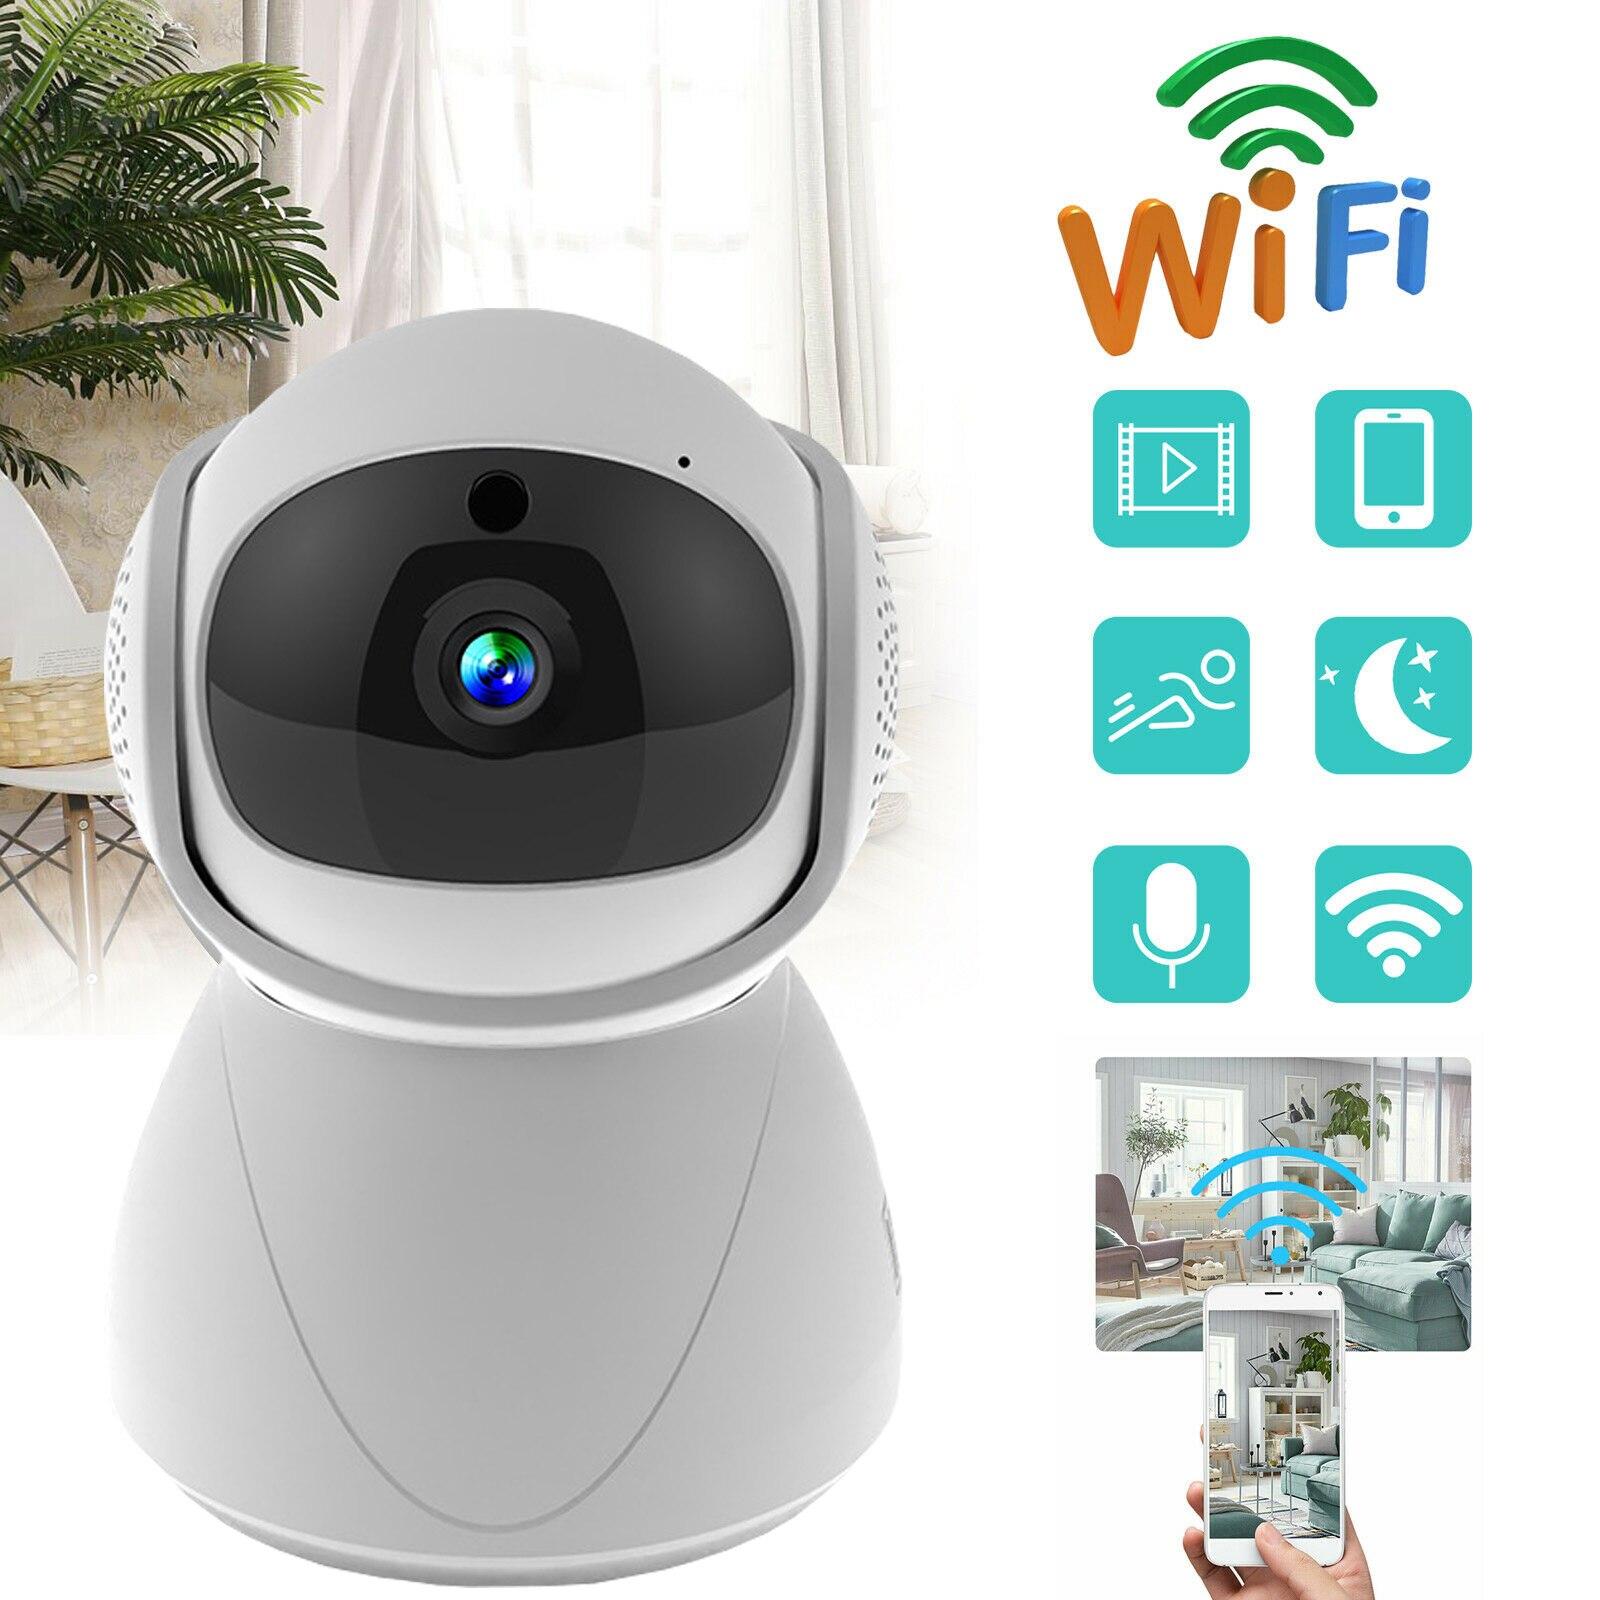 Hd1080p واي فاي ip كاميرا تلفزيونات الدوائر المغلقة الذكية التلقائي تتبع لاسلكي 5G 4G اتجاهين الاتصال الداخلي لمراقبة أمن الوطن